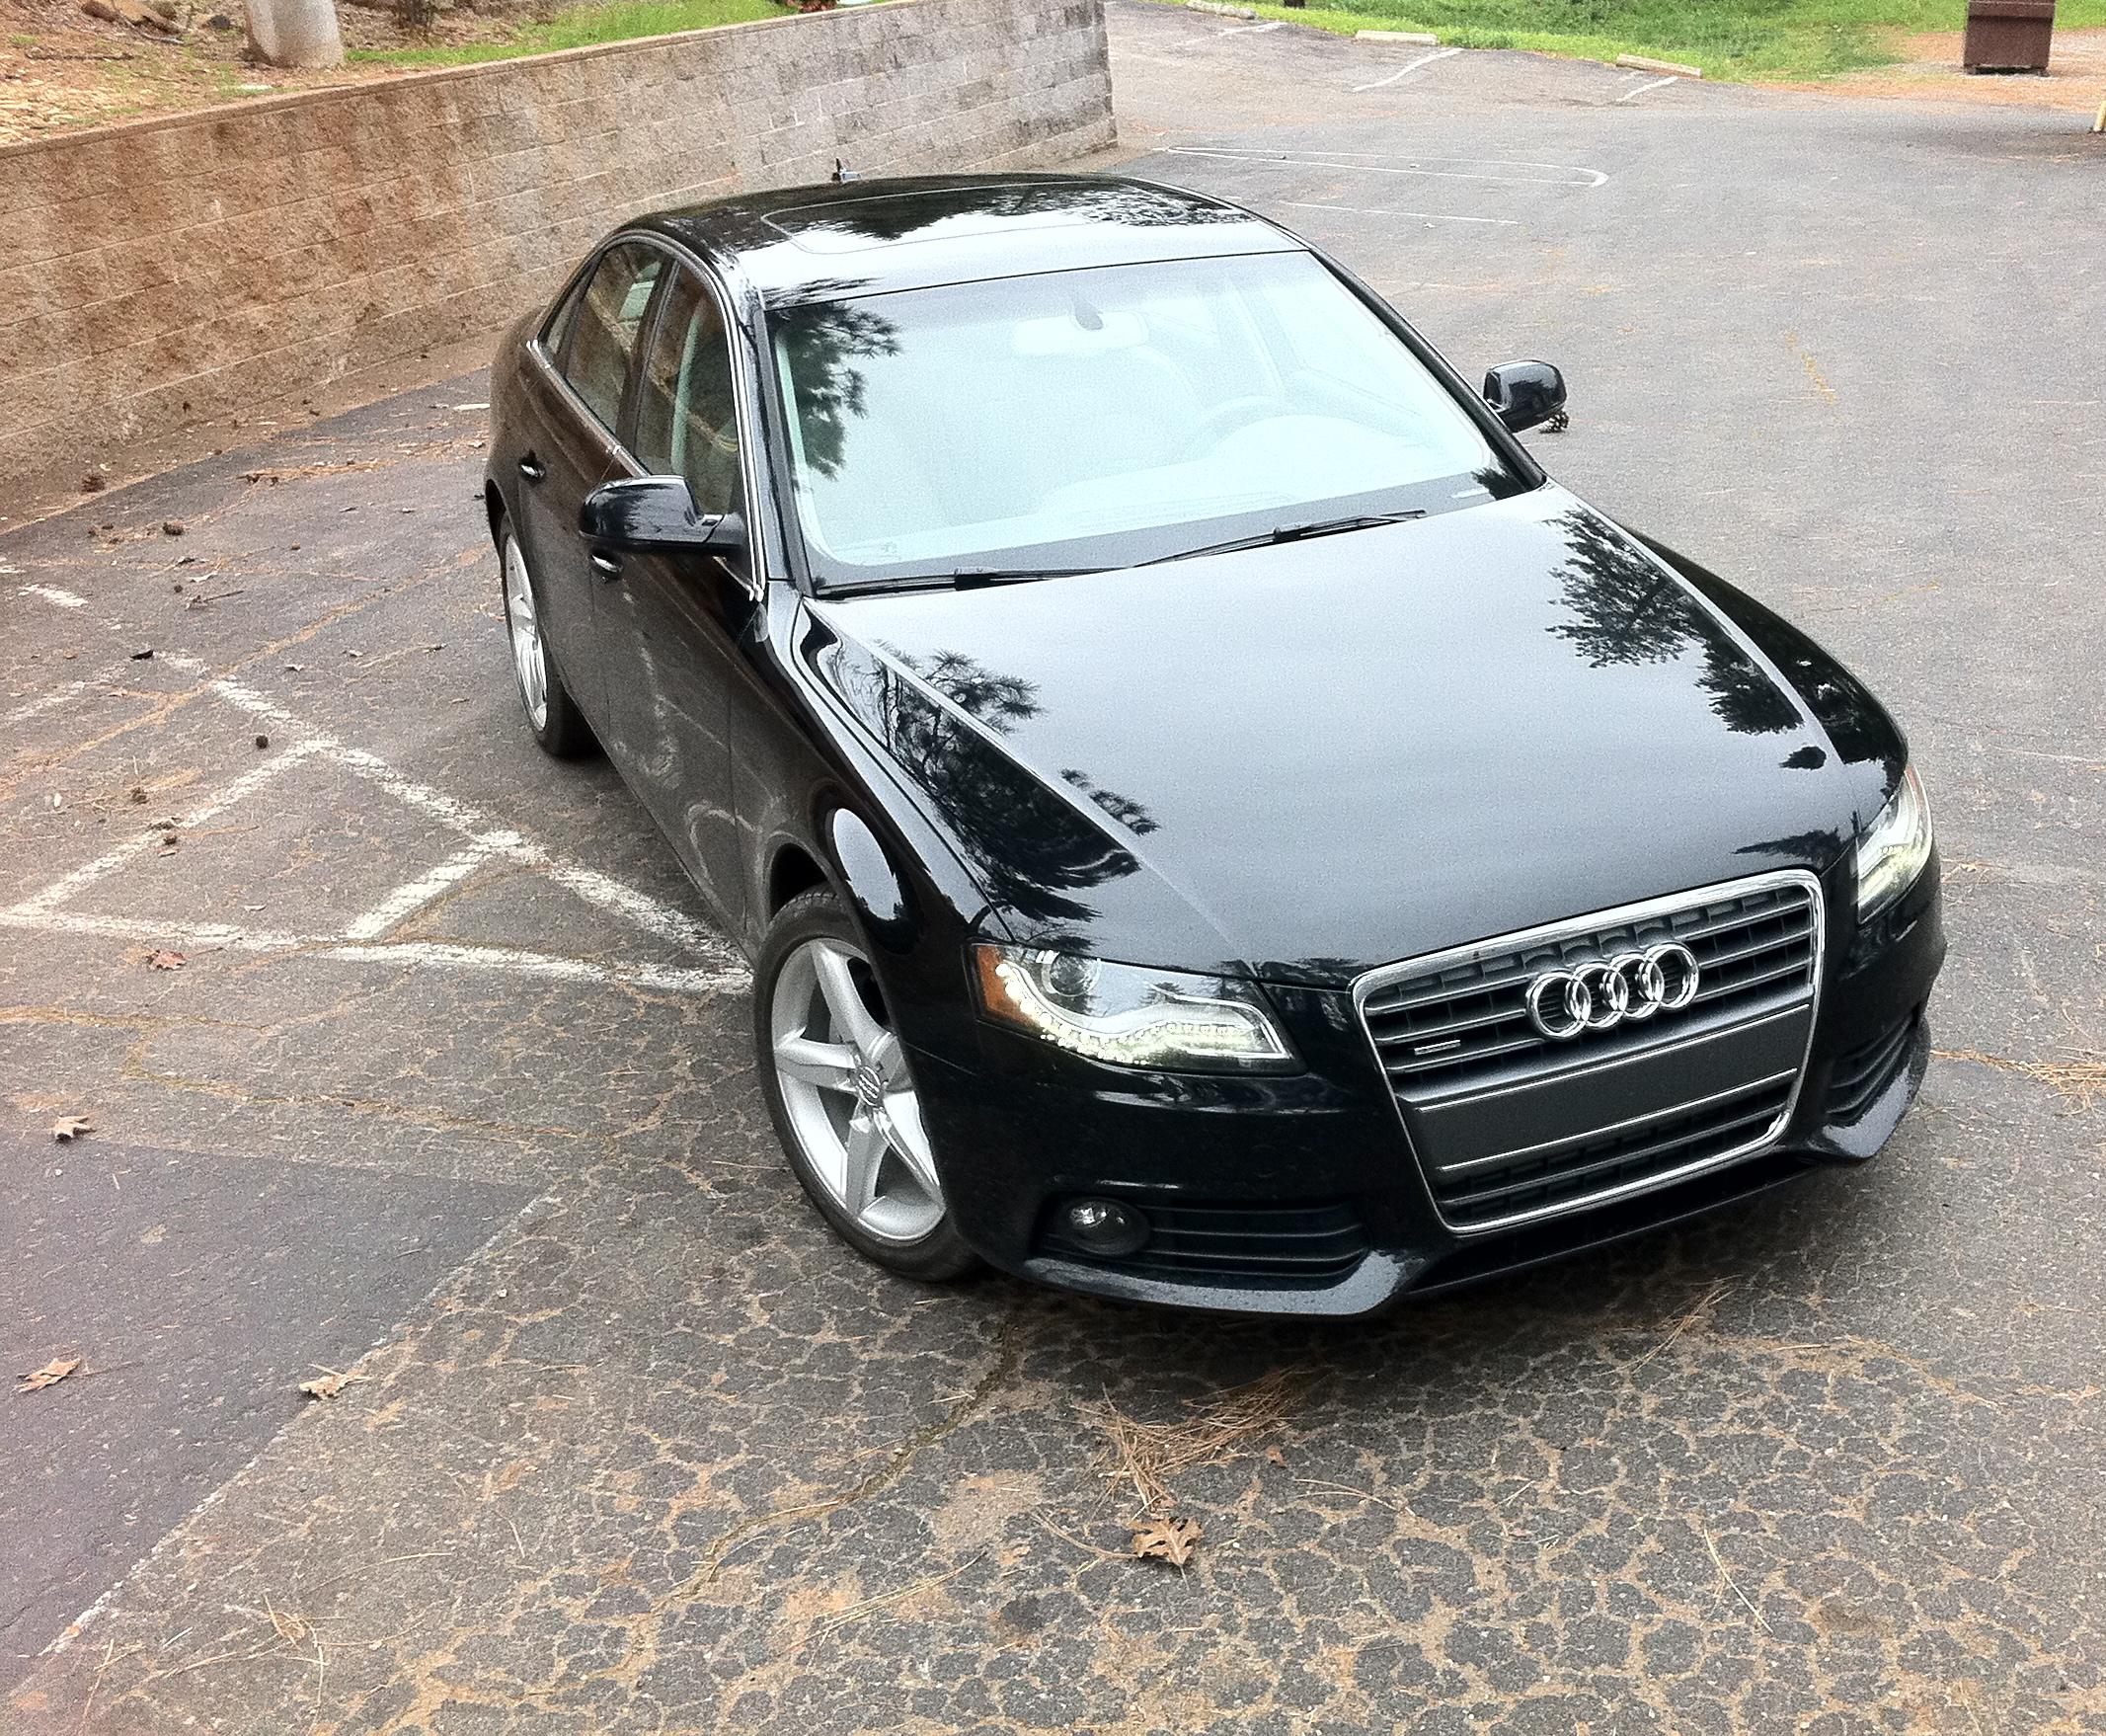 2011 Audi A4 Review